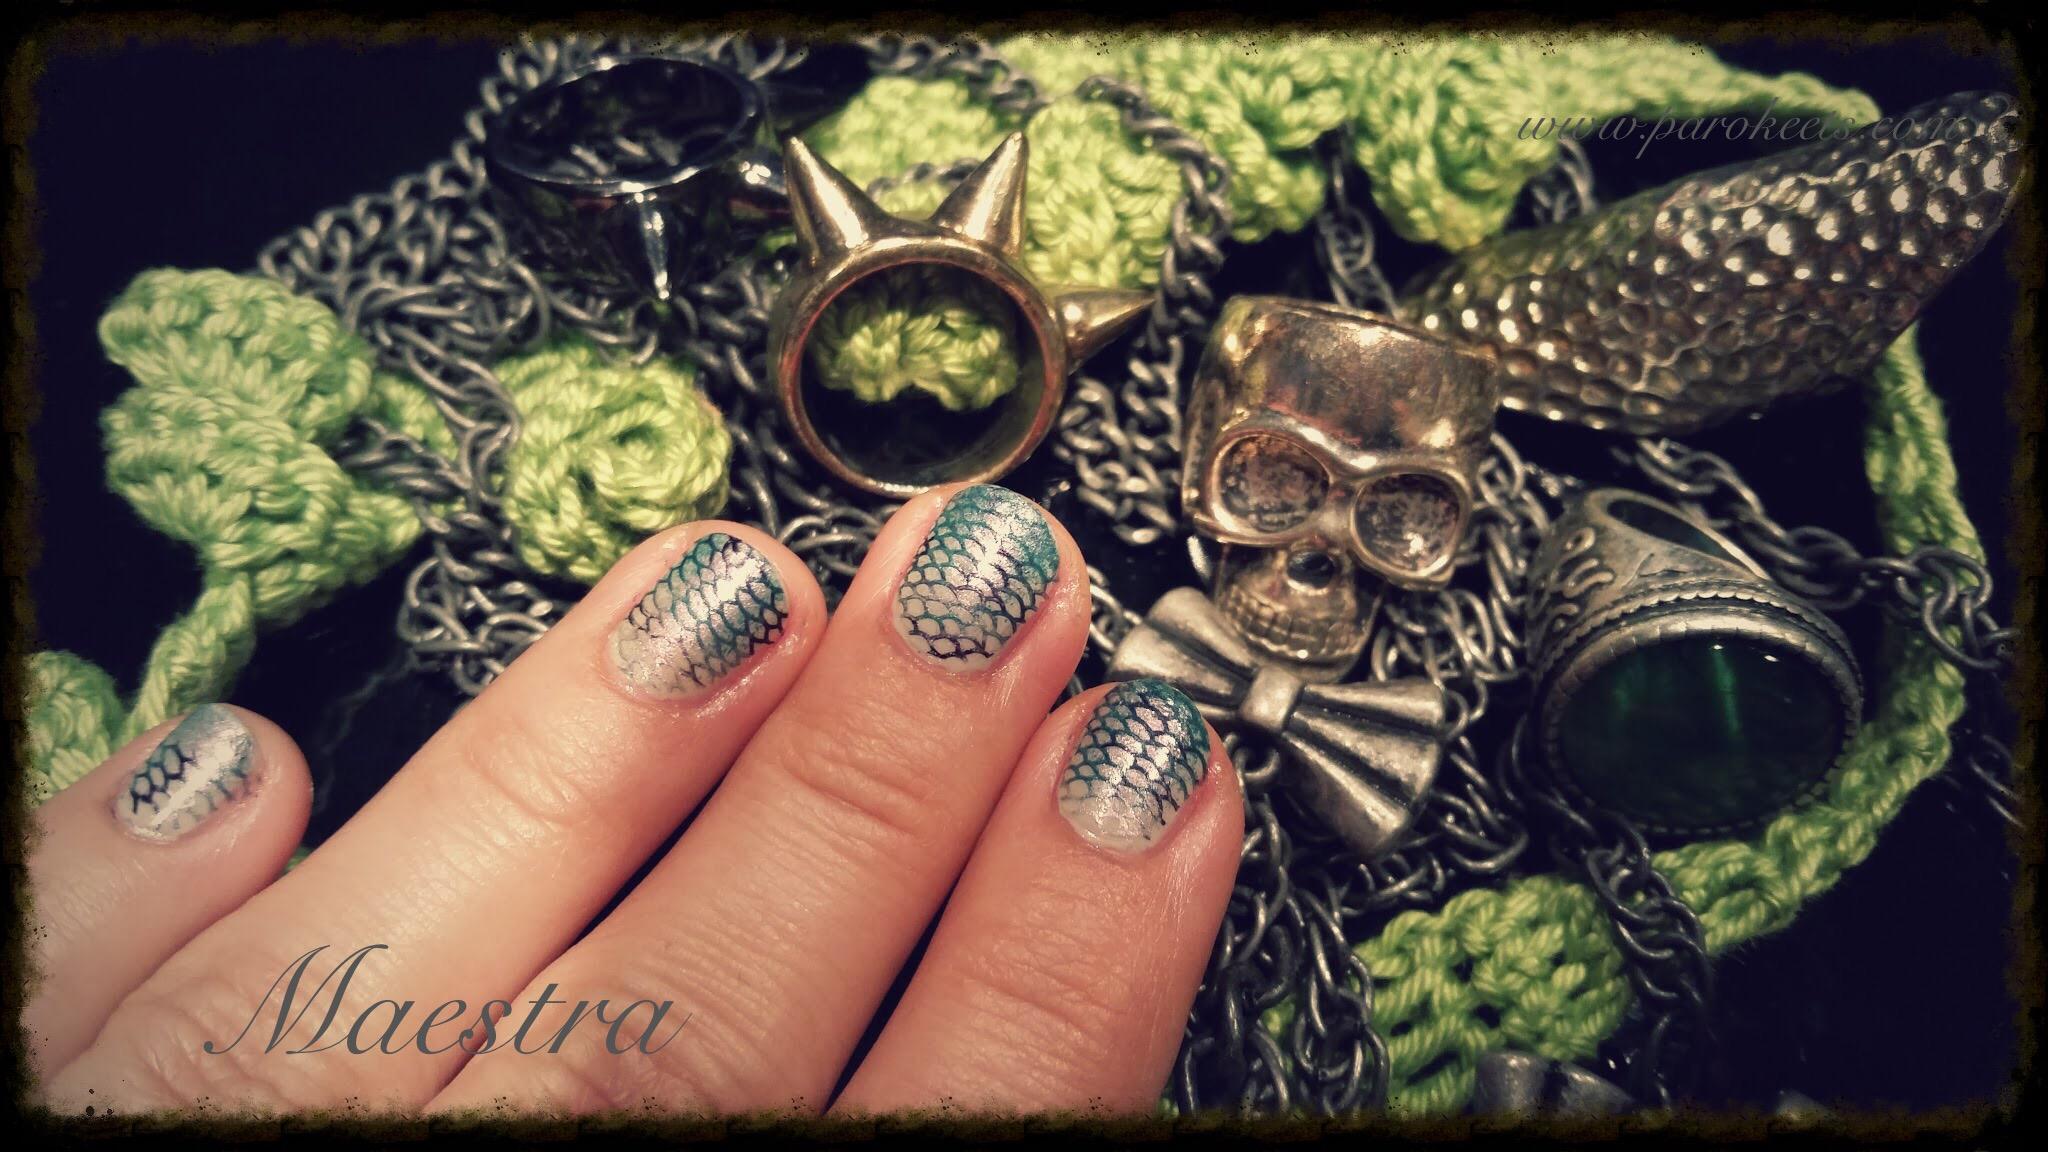 Maestra's Halloween manicure